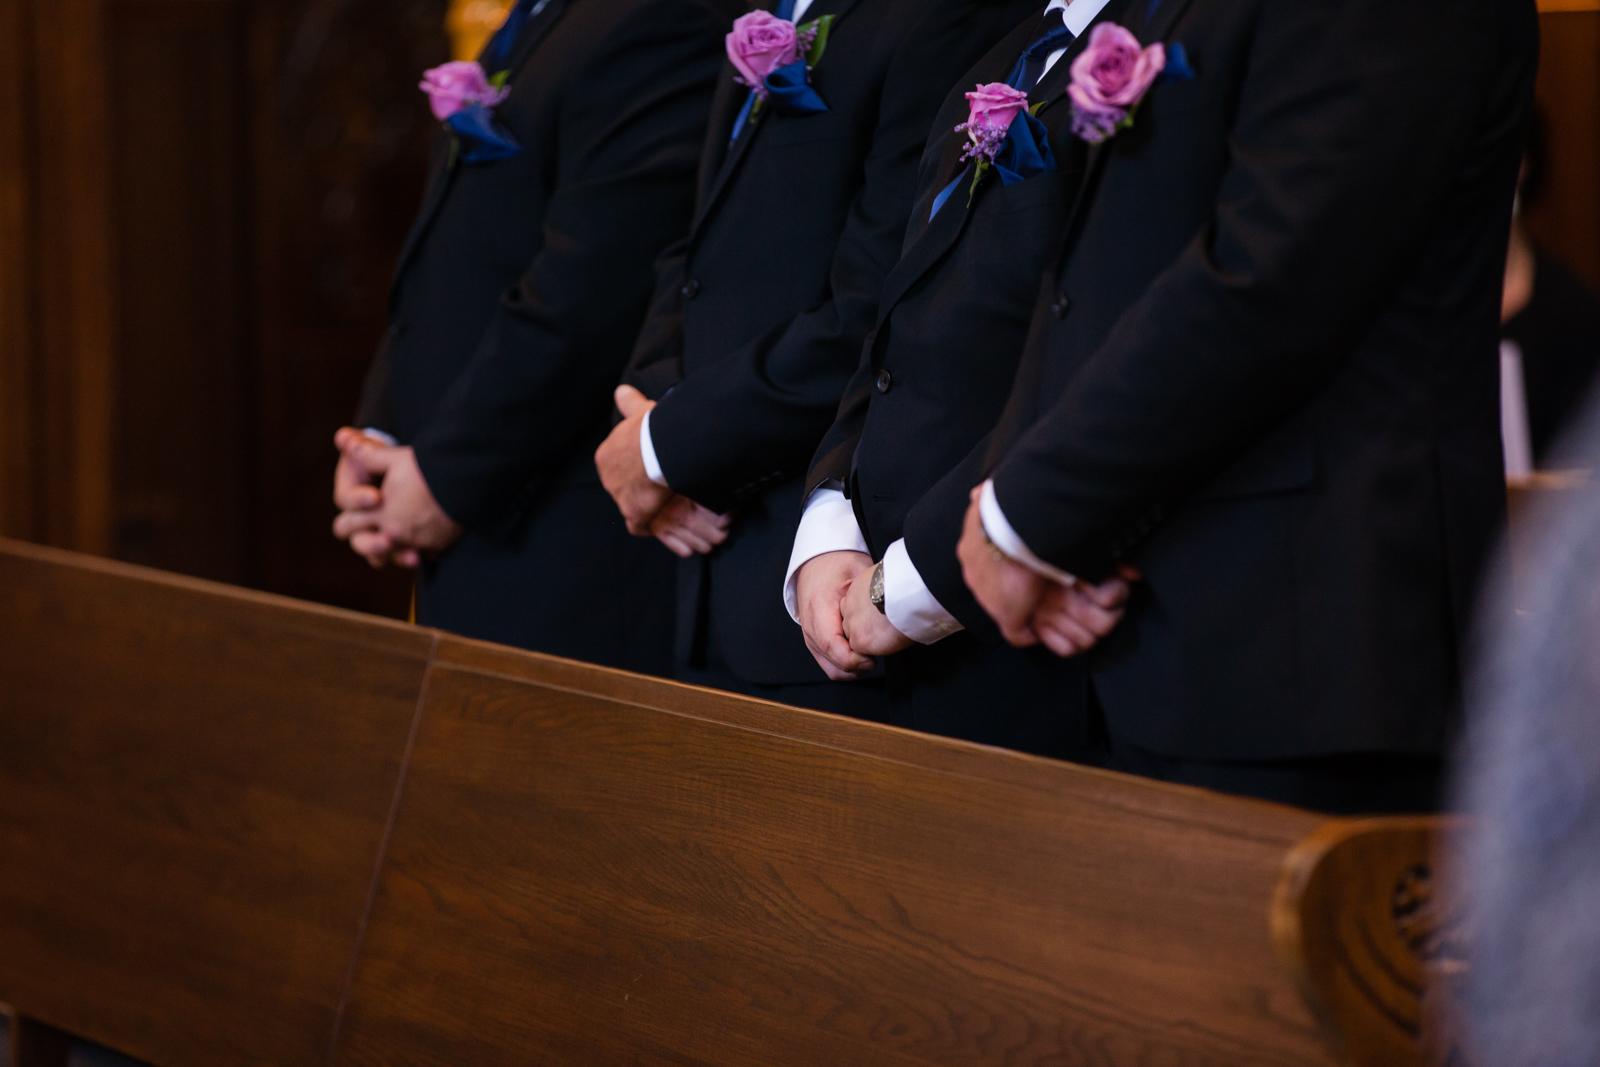 Eastons-Beach-Rotunda-Ballroom-Wedding-Newport-Rhode-Island-PhotographybyAmandaMorgan-41.jpg